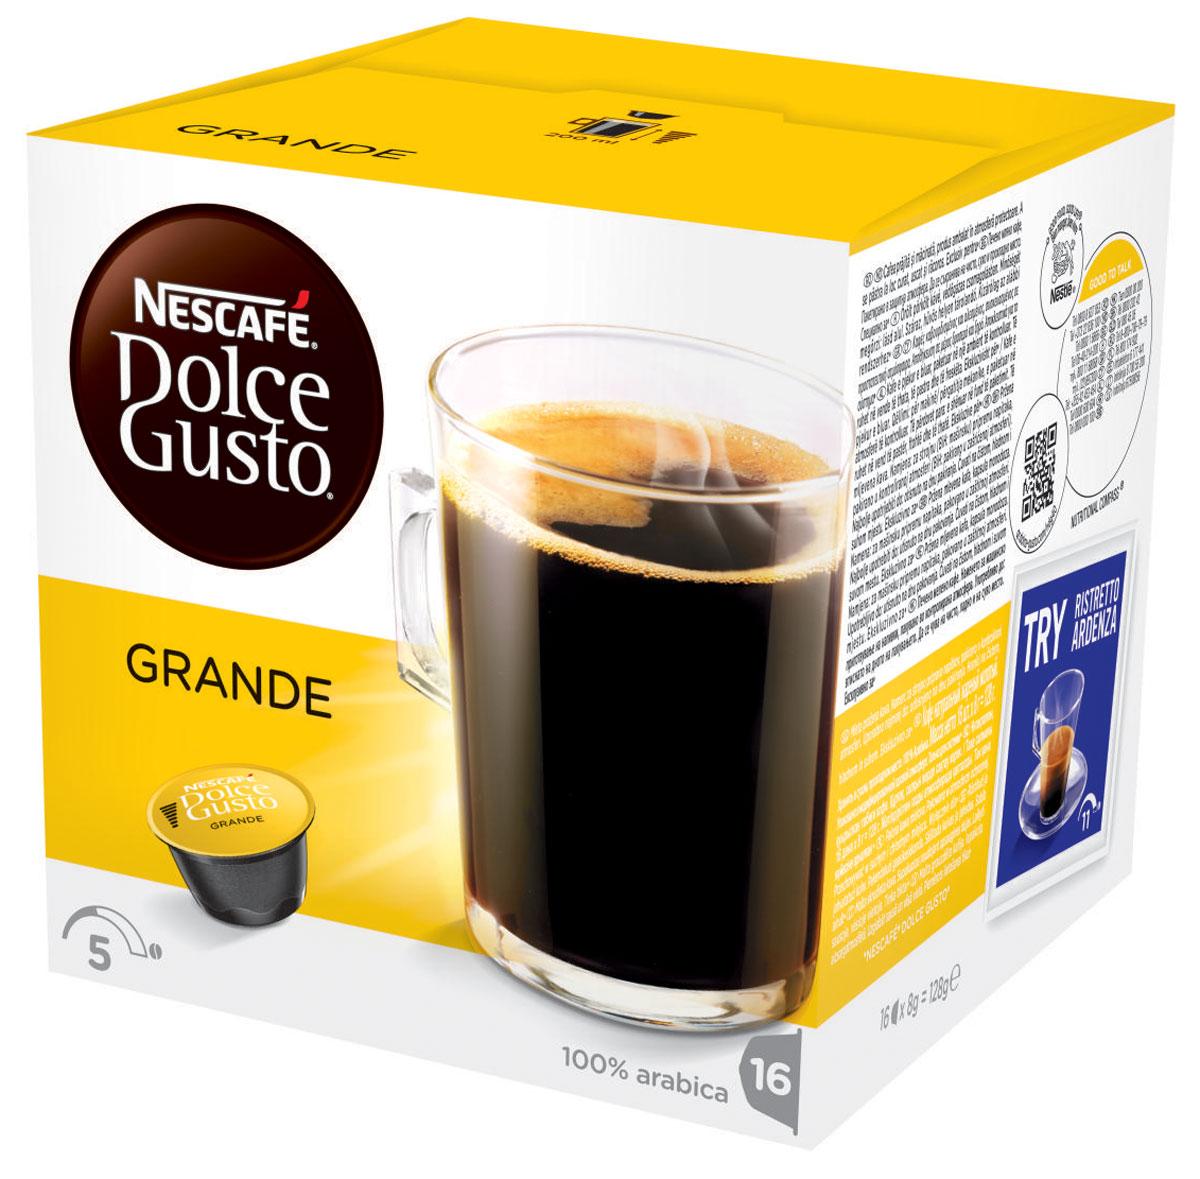 Nescafe Dolce Gusto Grande кофе в капсулах, 16 шт cotton ralph mesa grande